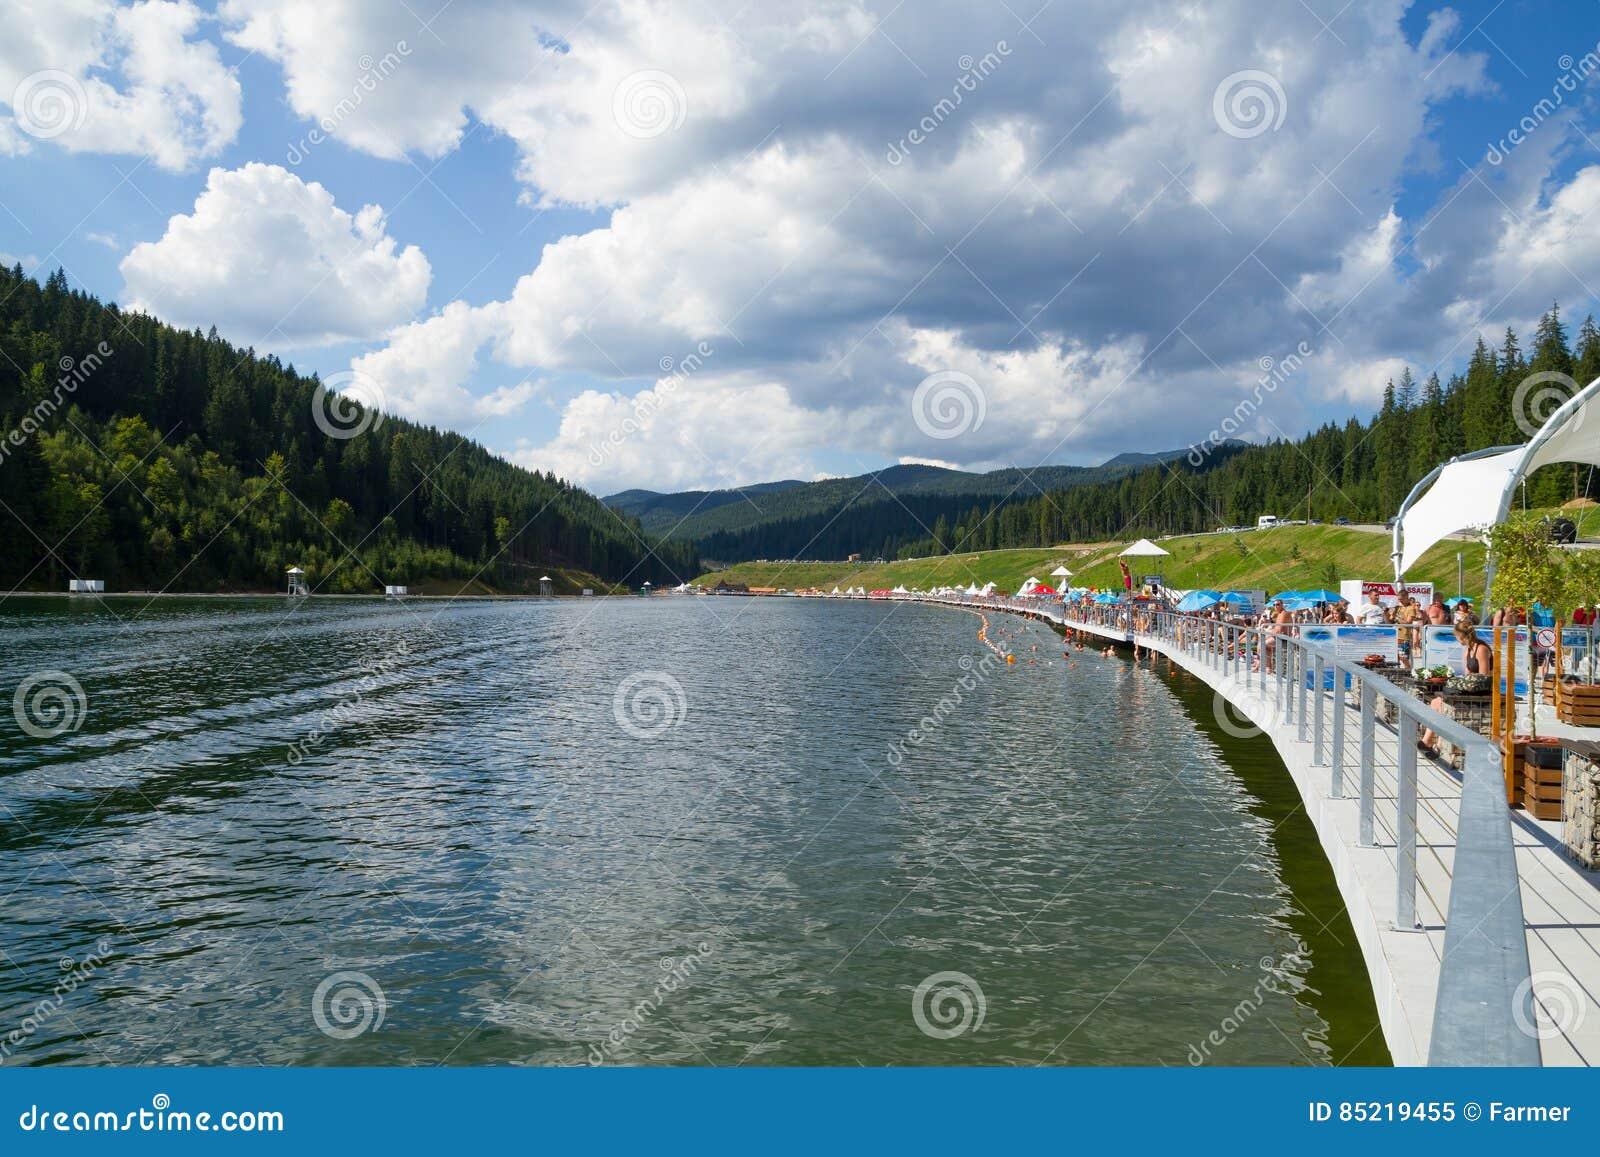 bukovel resort carpathian mountains in ukraine. editorial image